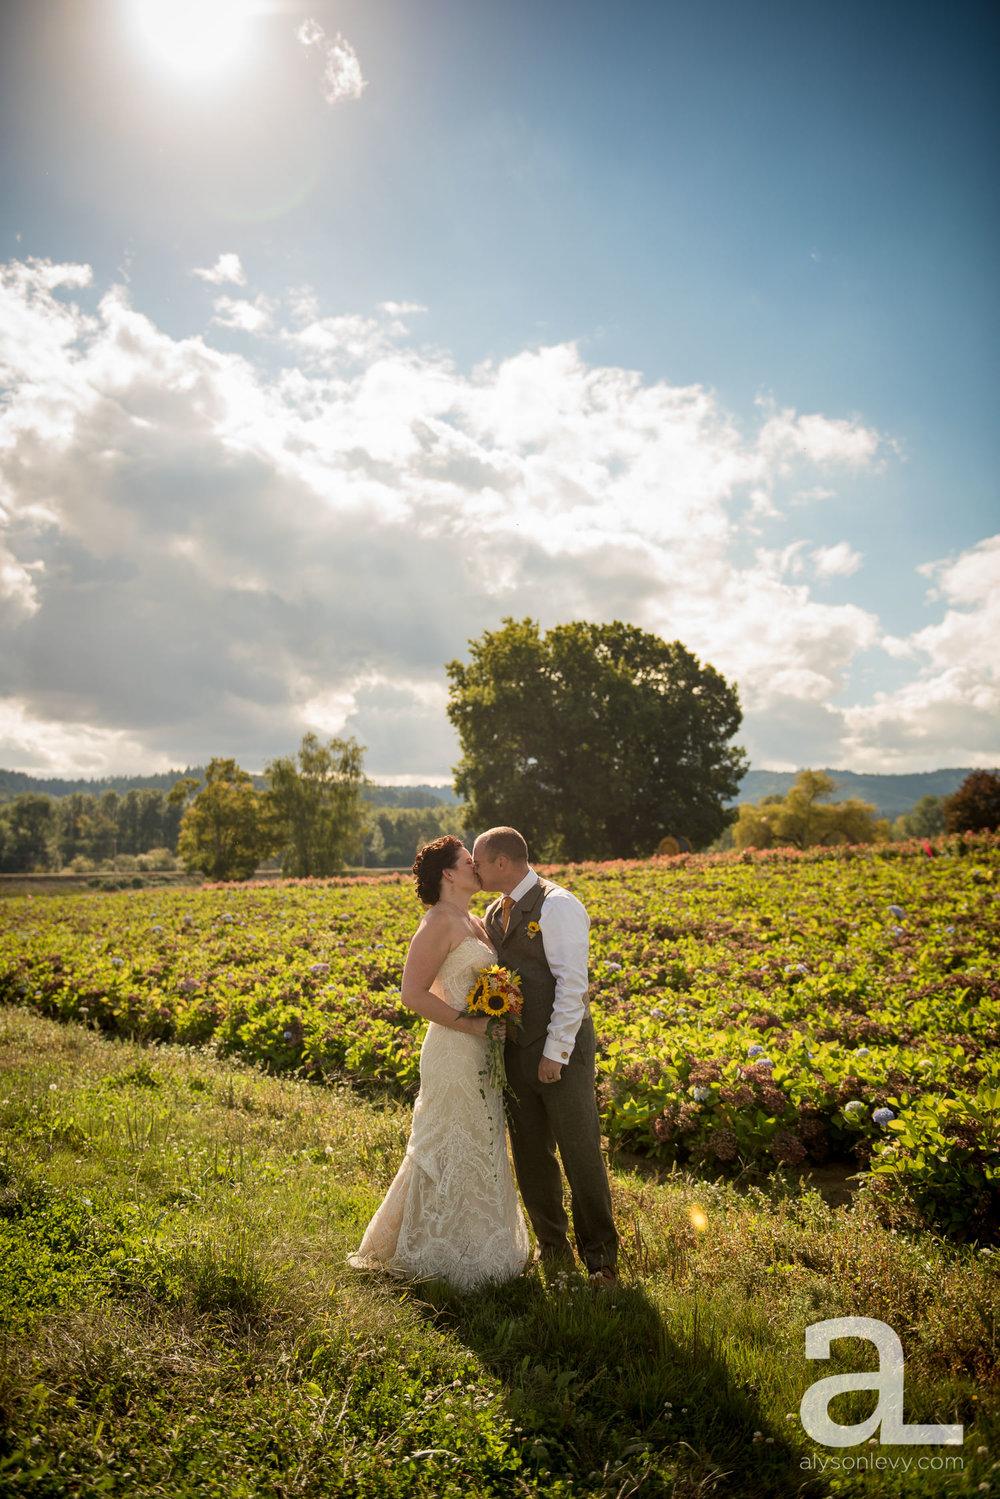 Krugers-Farm-Sauvie-Island-Wedding-Photography-007.jpg